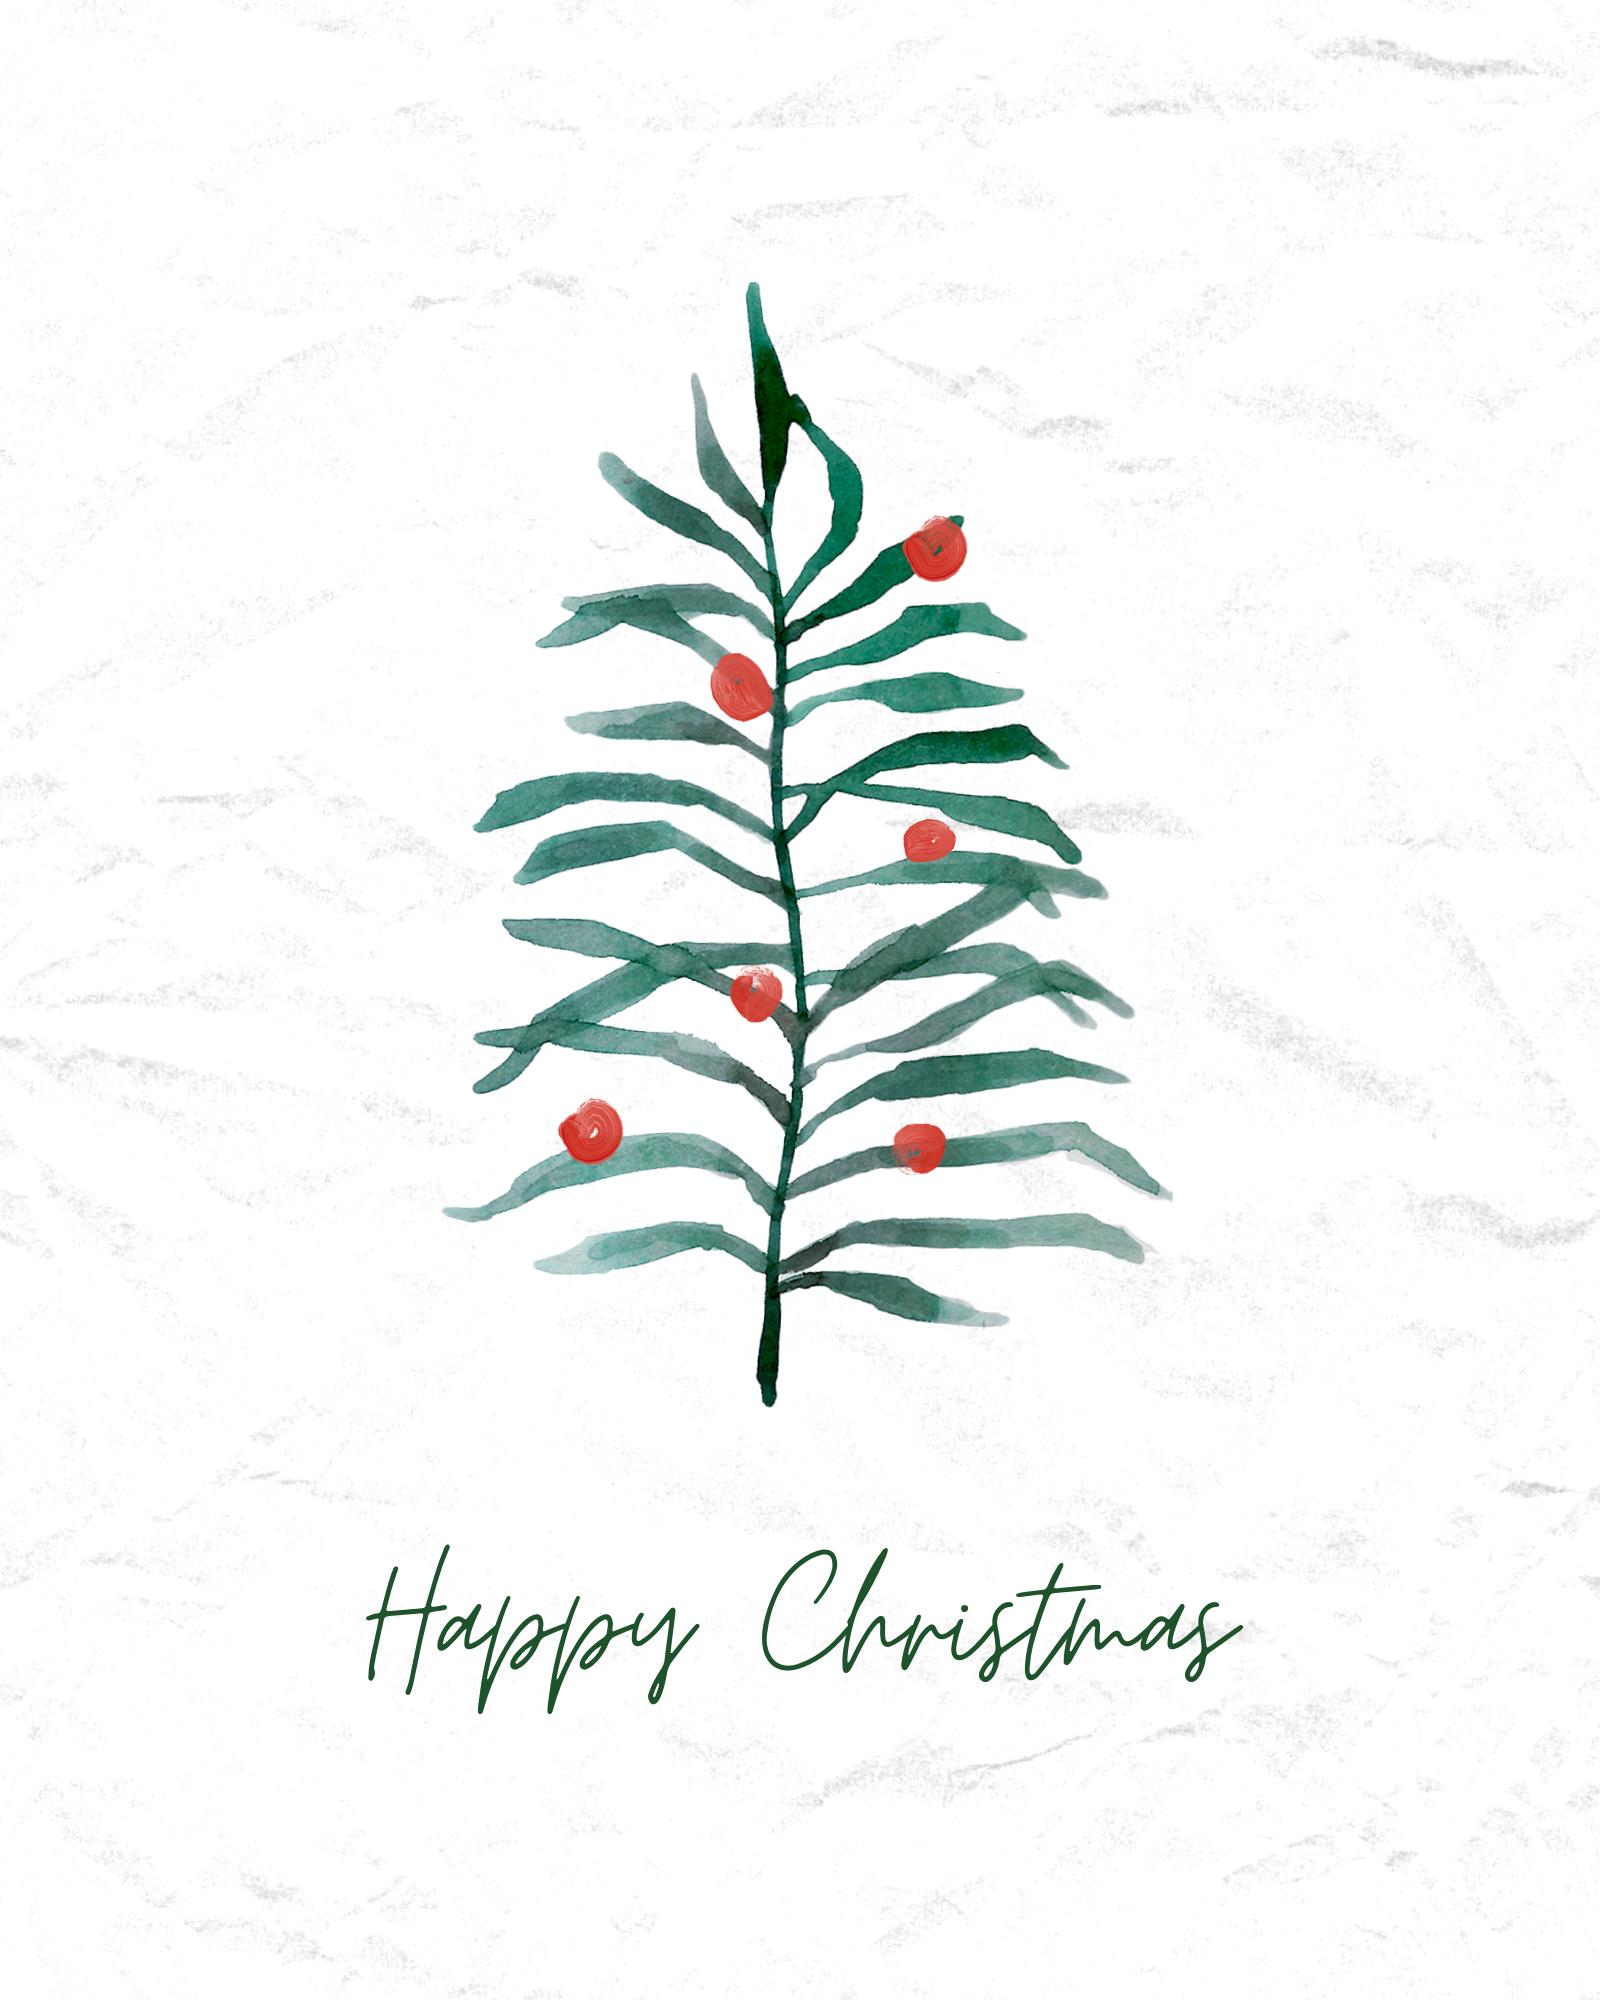 Merry Christmas post